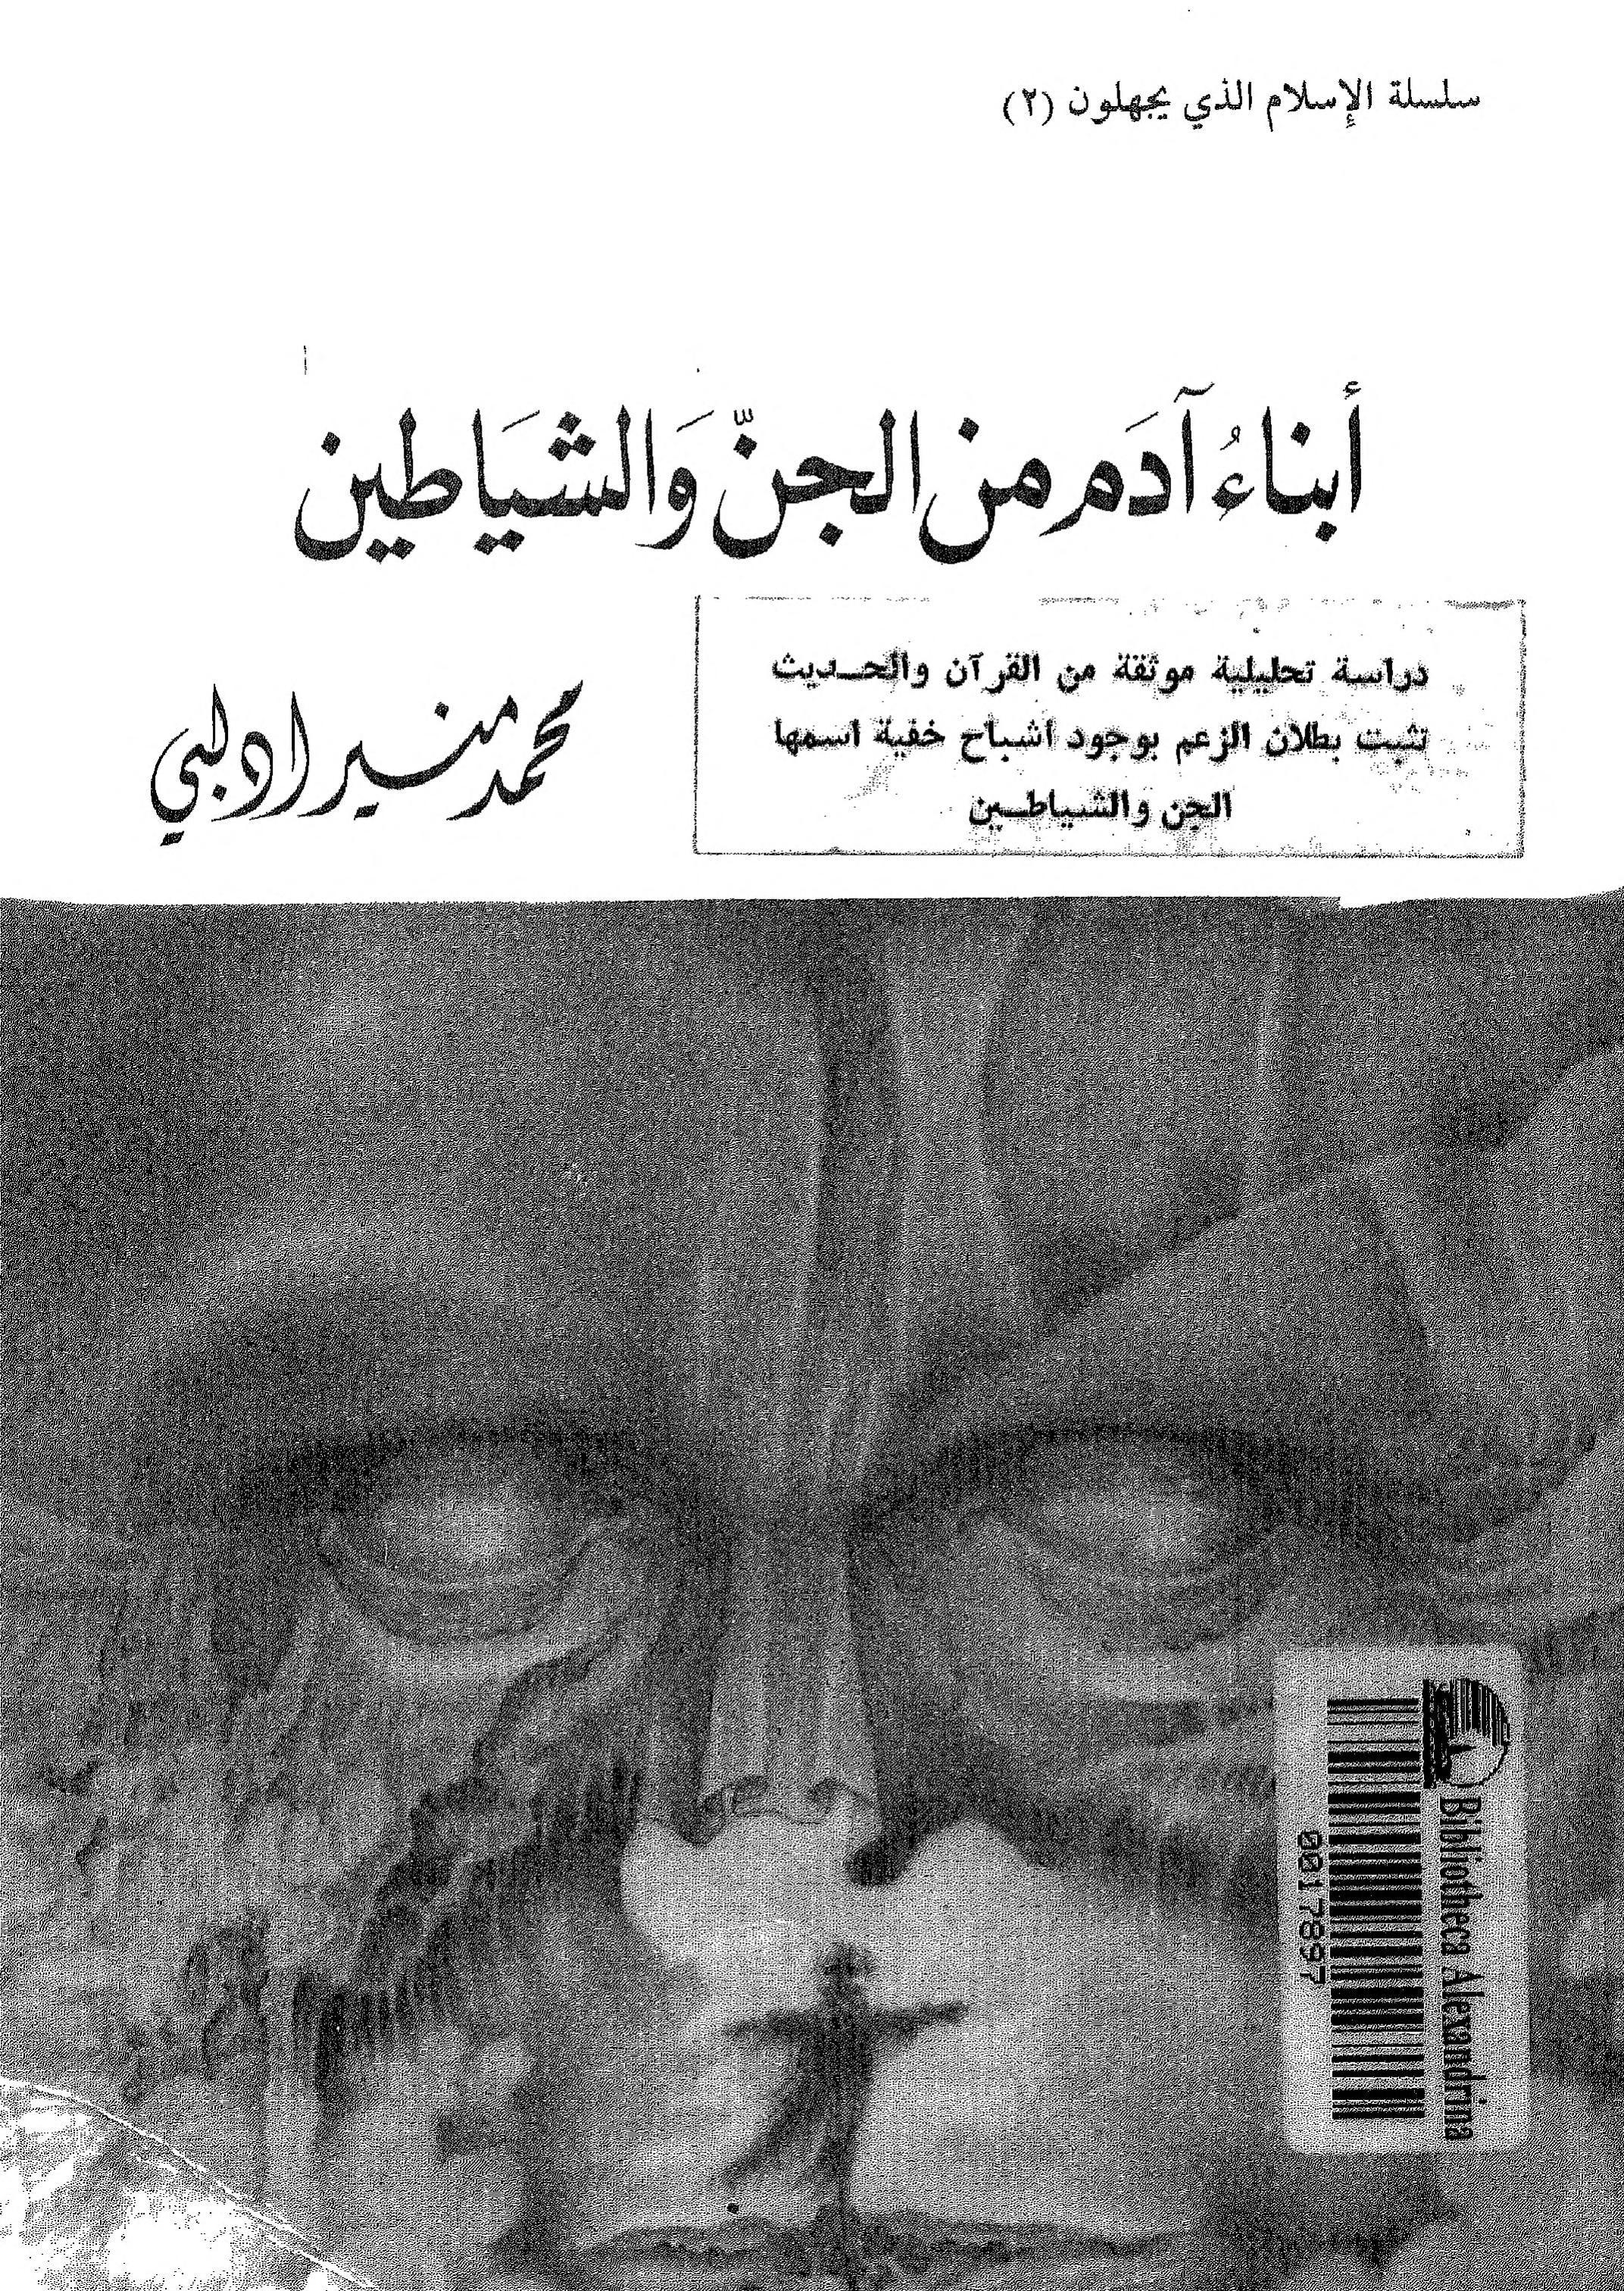 أبناء آدم من الجن و الشياطين محمد منير إدلبي Free Download Borrow And Streaming Internet Archive Pdf Books Reading Ebooks Free Books Arabic Books